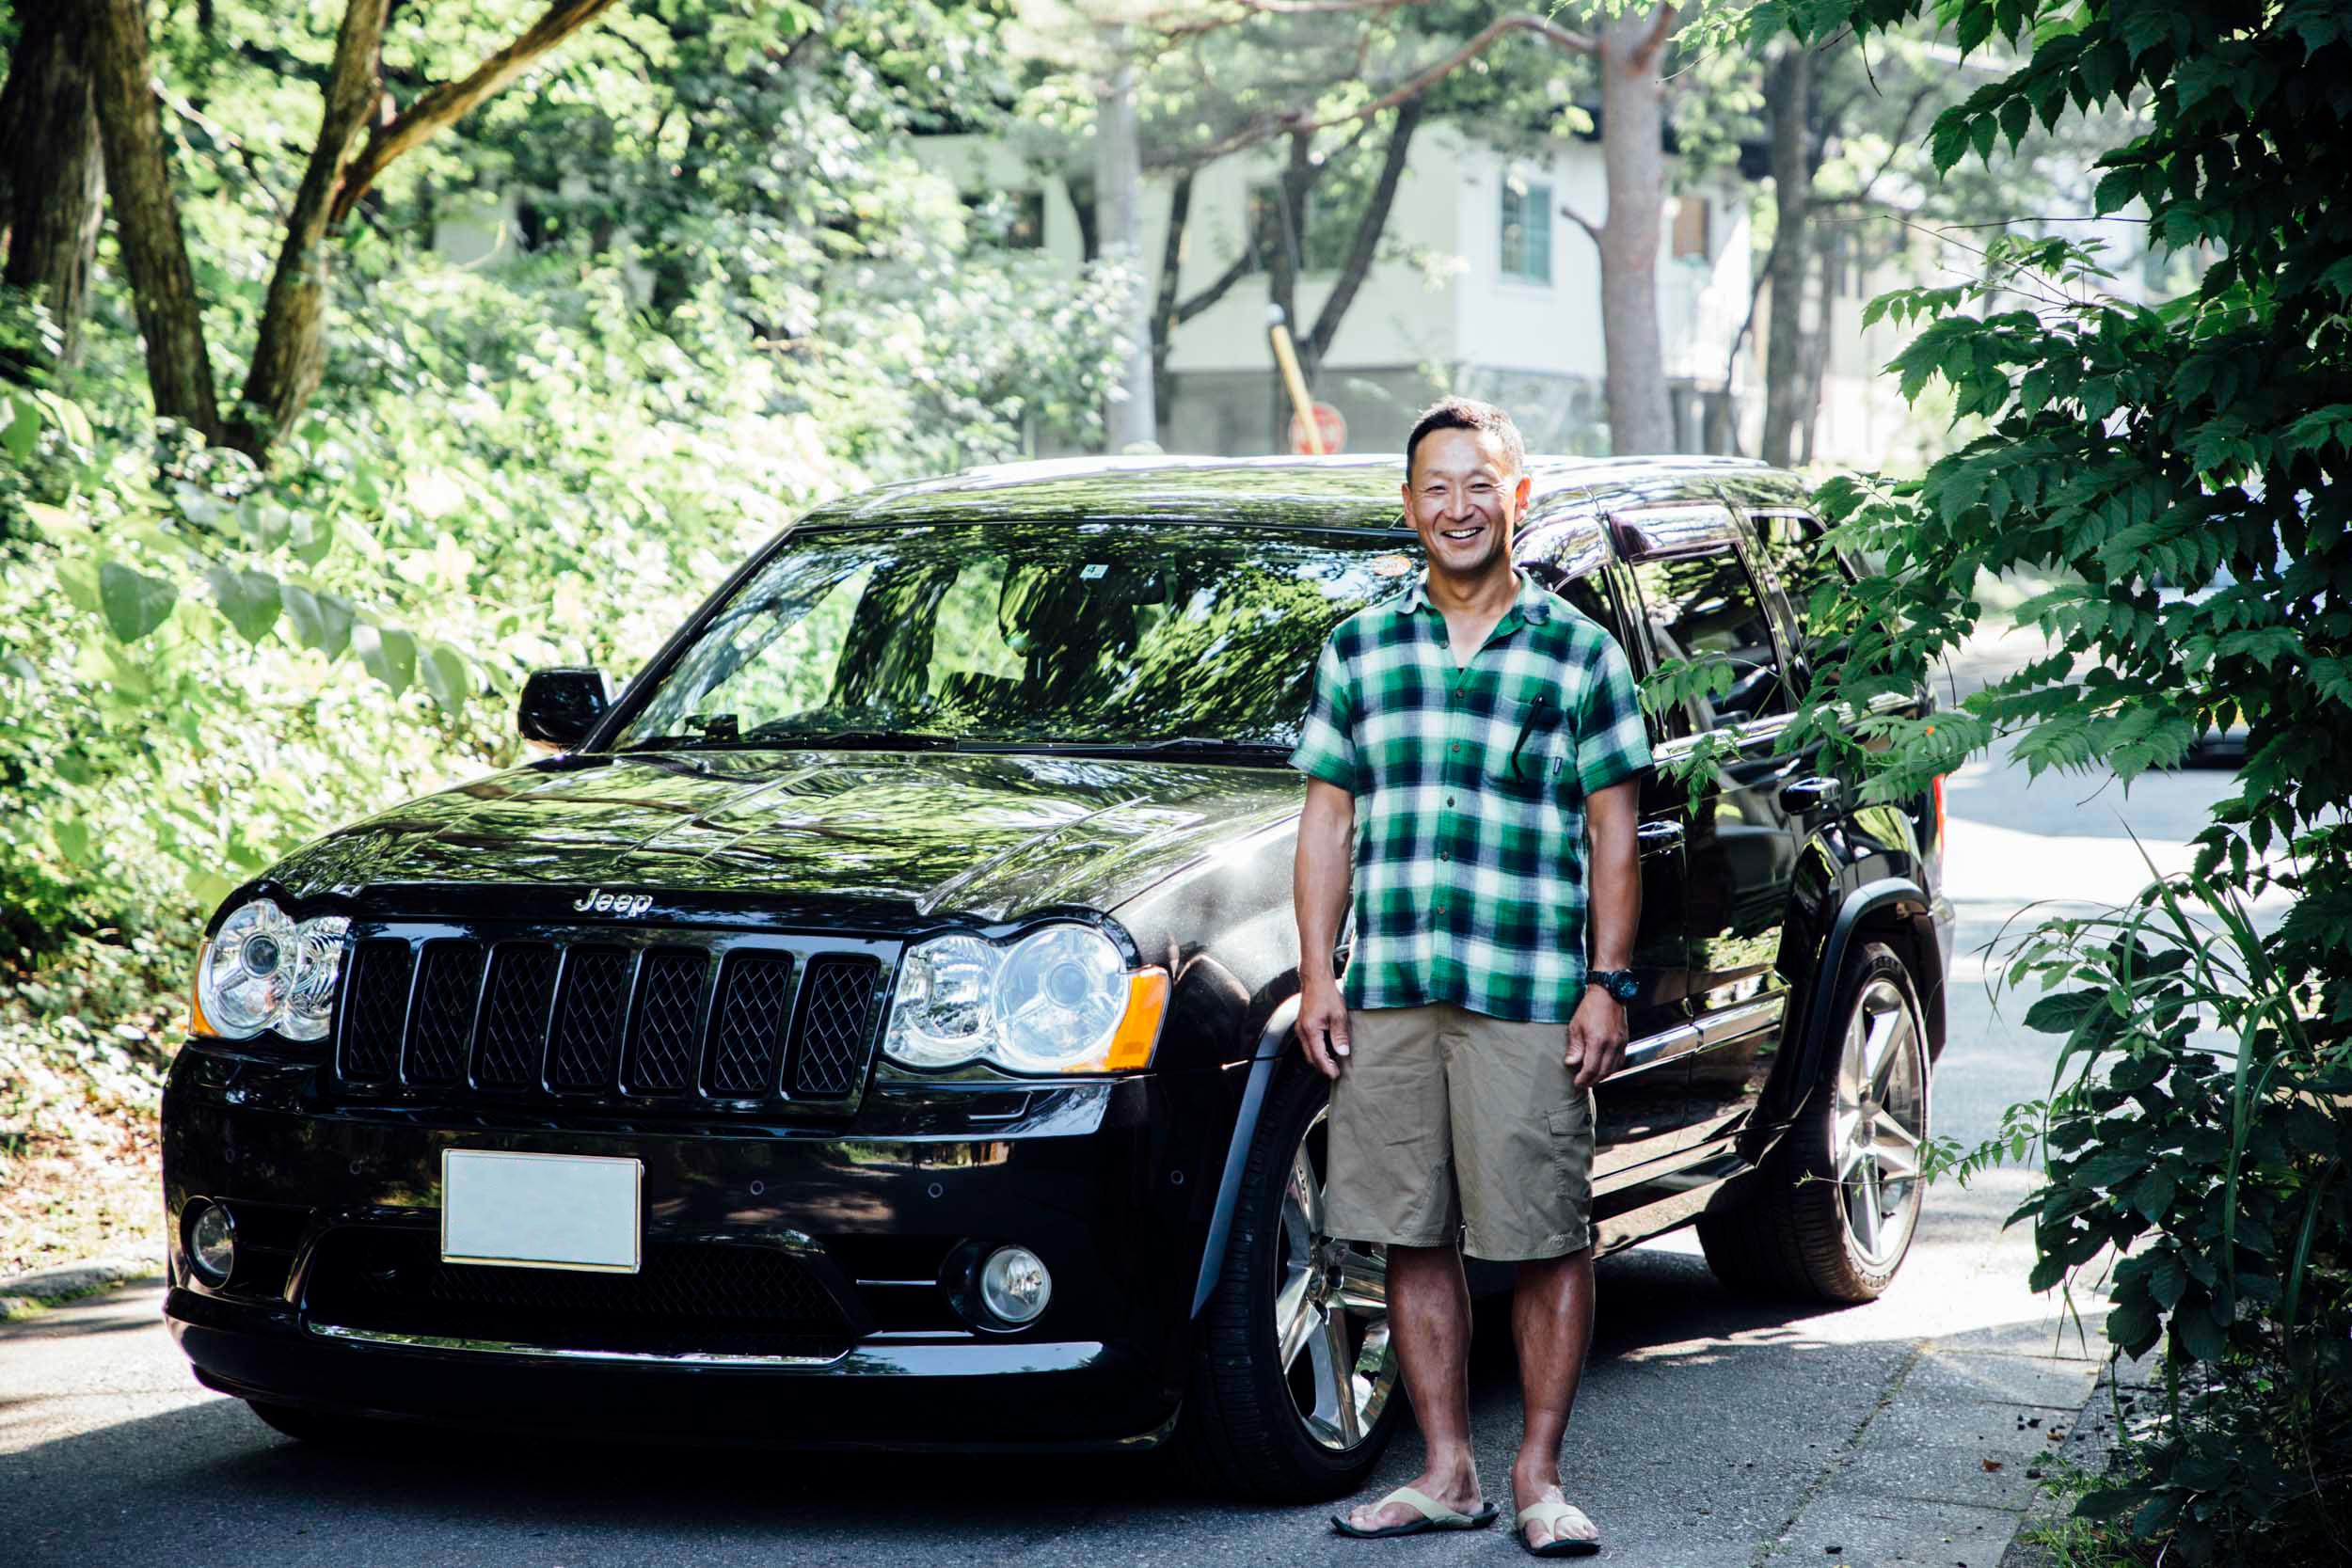 MG_5017-1 長野県白馬村、Grand Cherokeeオーナーへインタビュー。避暑地としてもアクティブに過ごすにも良し!カフェ観光スポットもご紹介